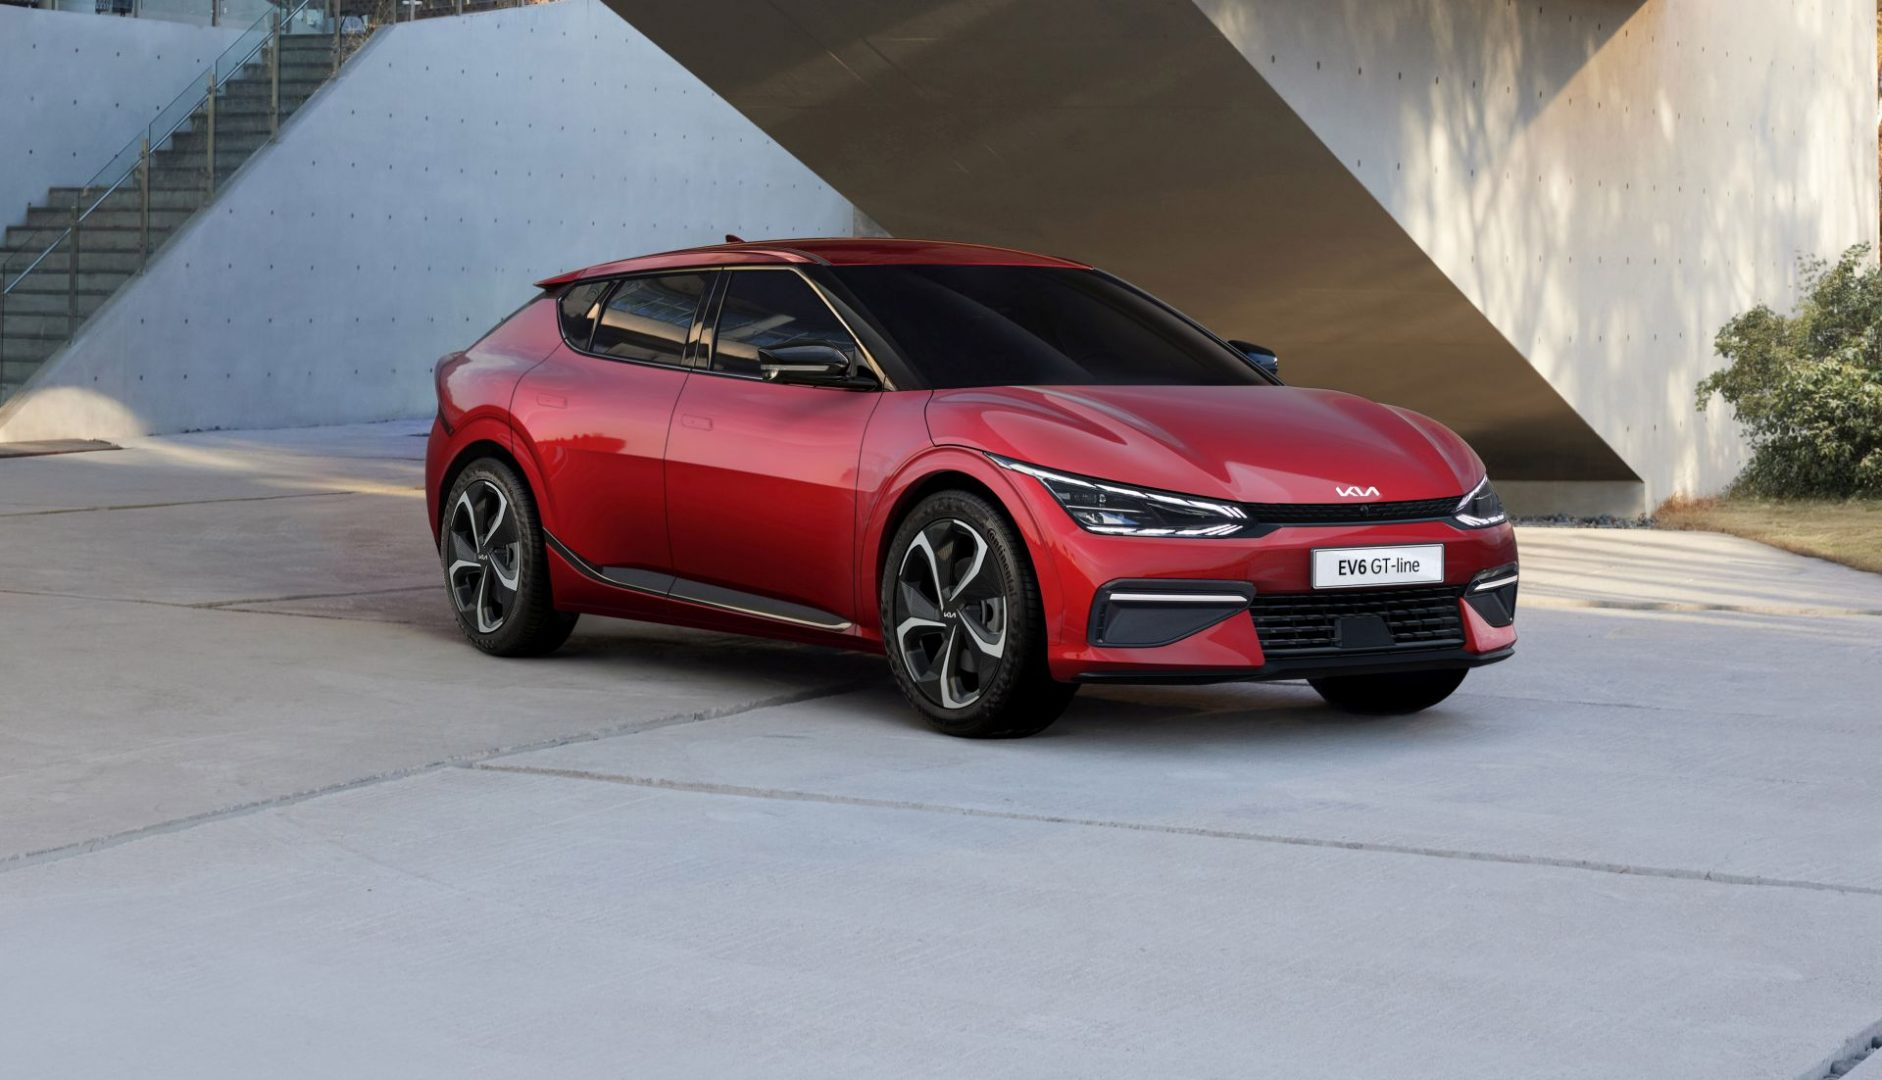 Kia EV6 – konačno znamo sve detalje o novom električnom crossoveru